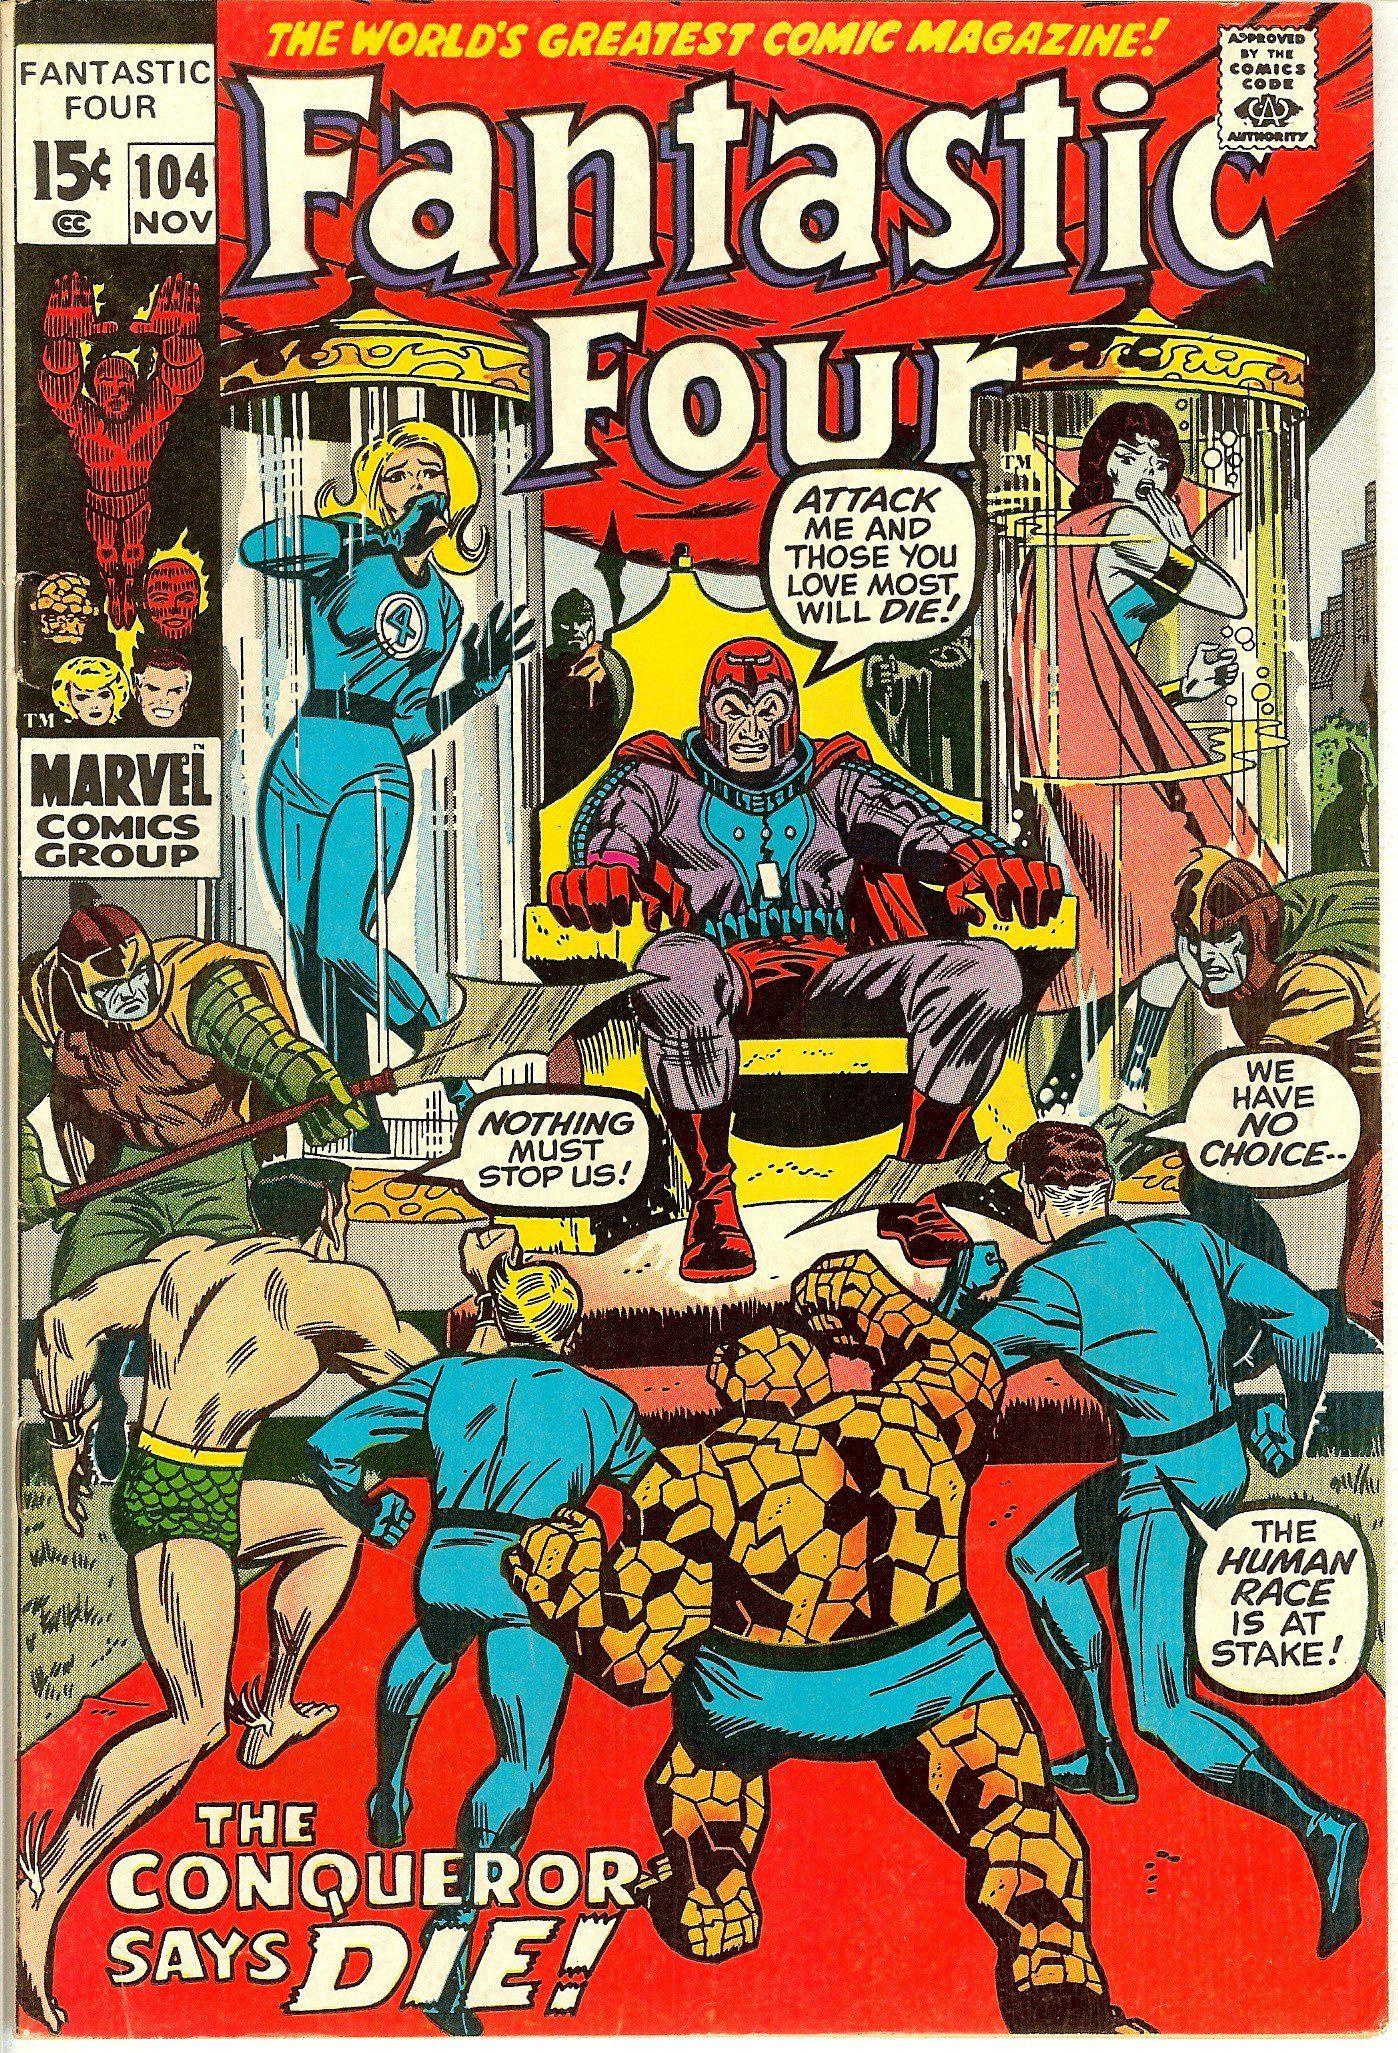 THOR MIGHTY #18 MARVEL COMICS JUNE 2017 VF 8.0